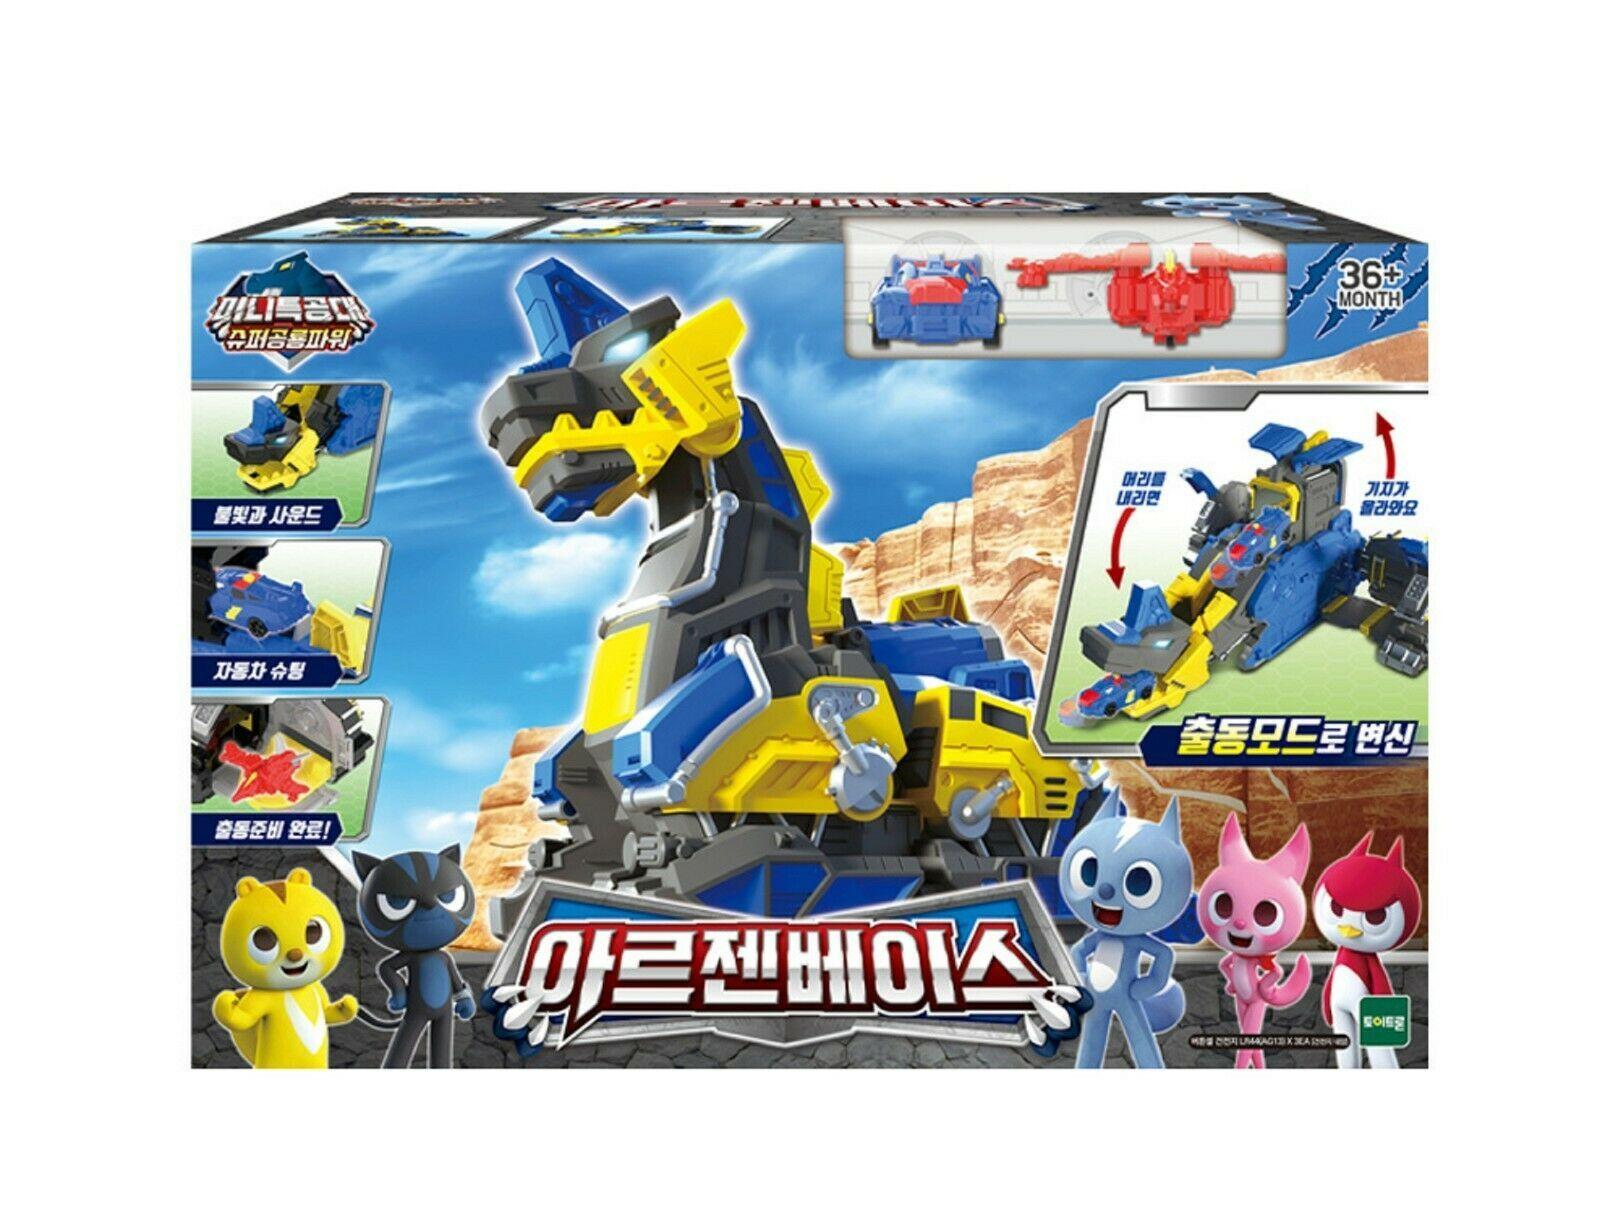 Miniforce Argen Base Super Dinosaur Power Transformation Toy Action Figure